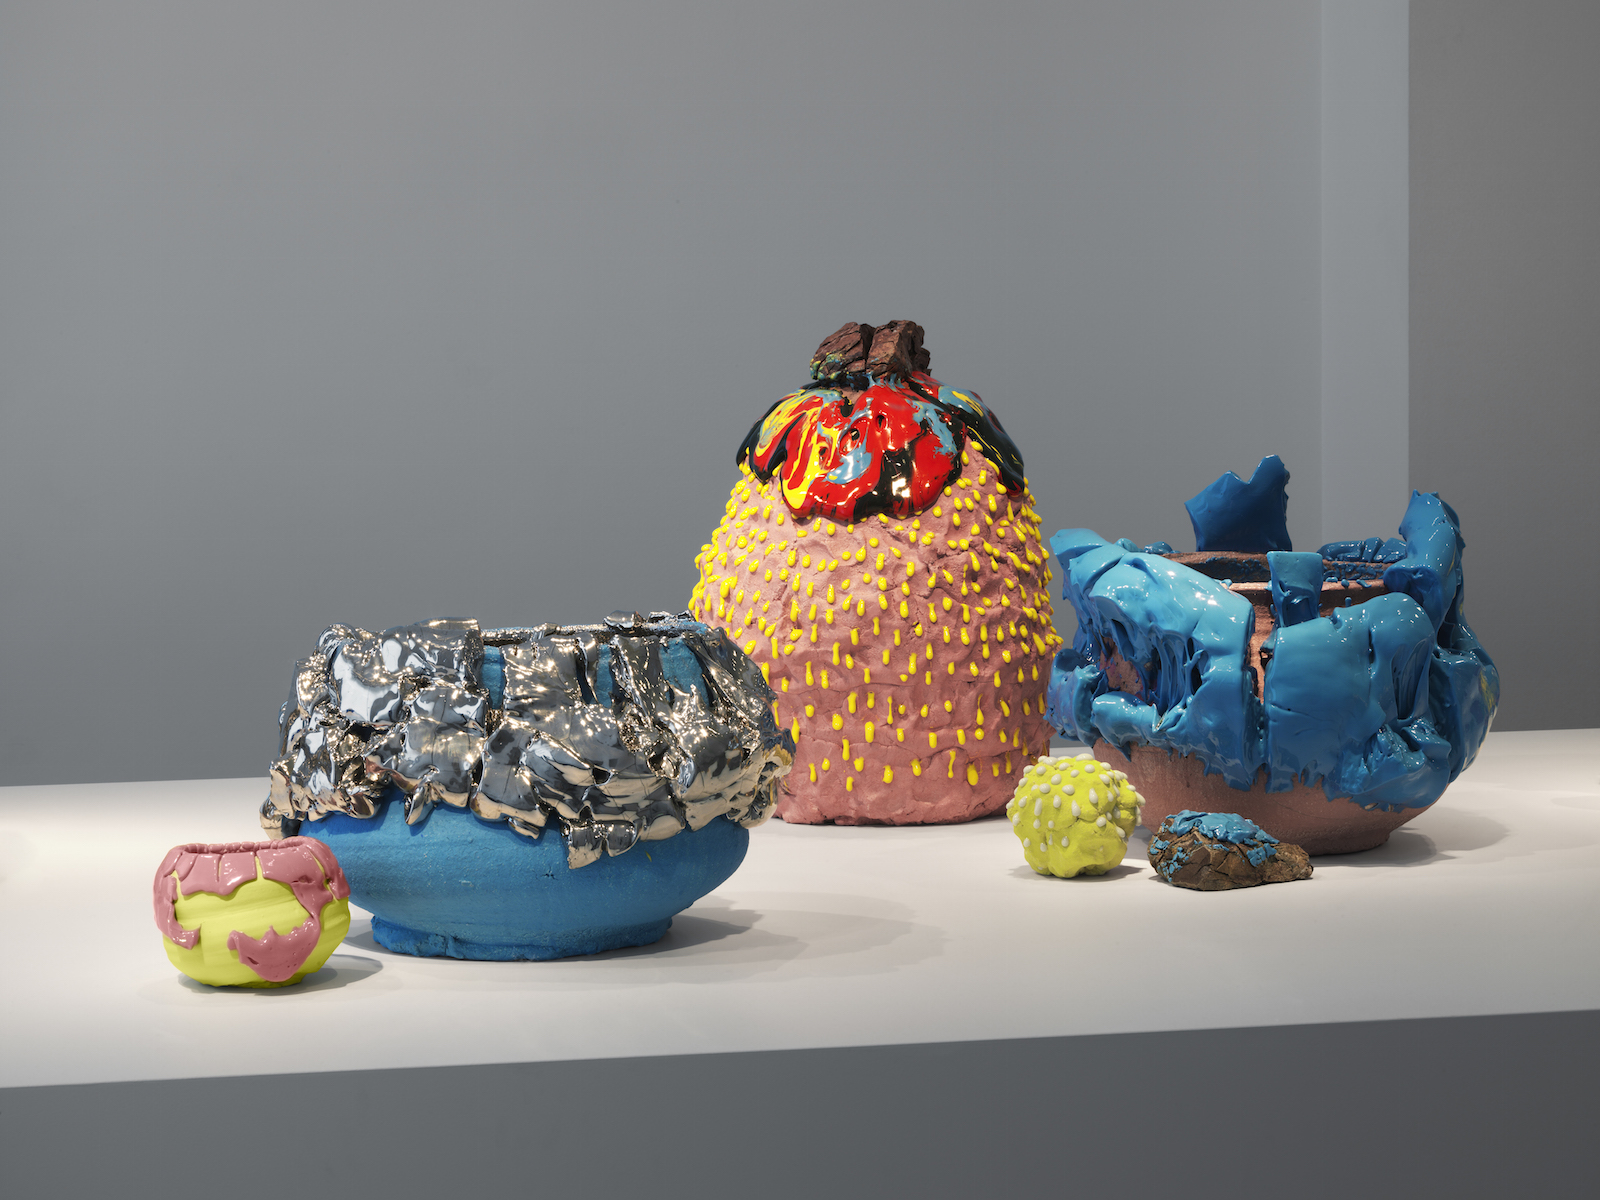 Extraordinary Contemporary Sculptures by Takuro Kuwata - From Nature Exhibition takuro kuwata Extraordinary Contemporary Sculptures by Takuro Kuwata Extraordinary Contemporary Sculptures by Takuro Kuwata From Nature Exhibition